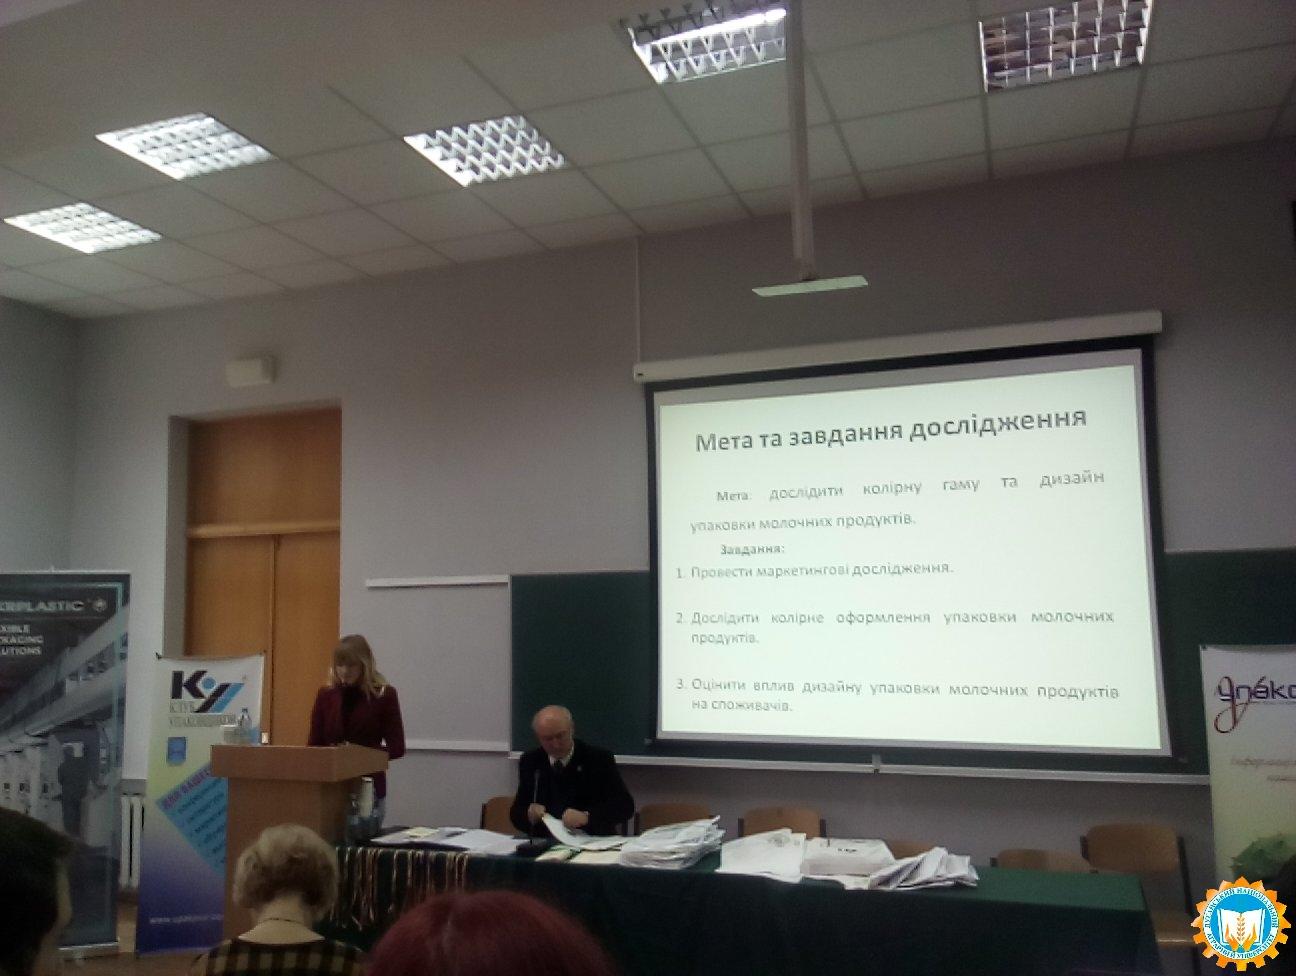 Zolotyy_kashtan_04